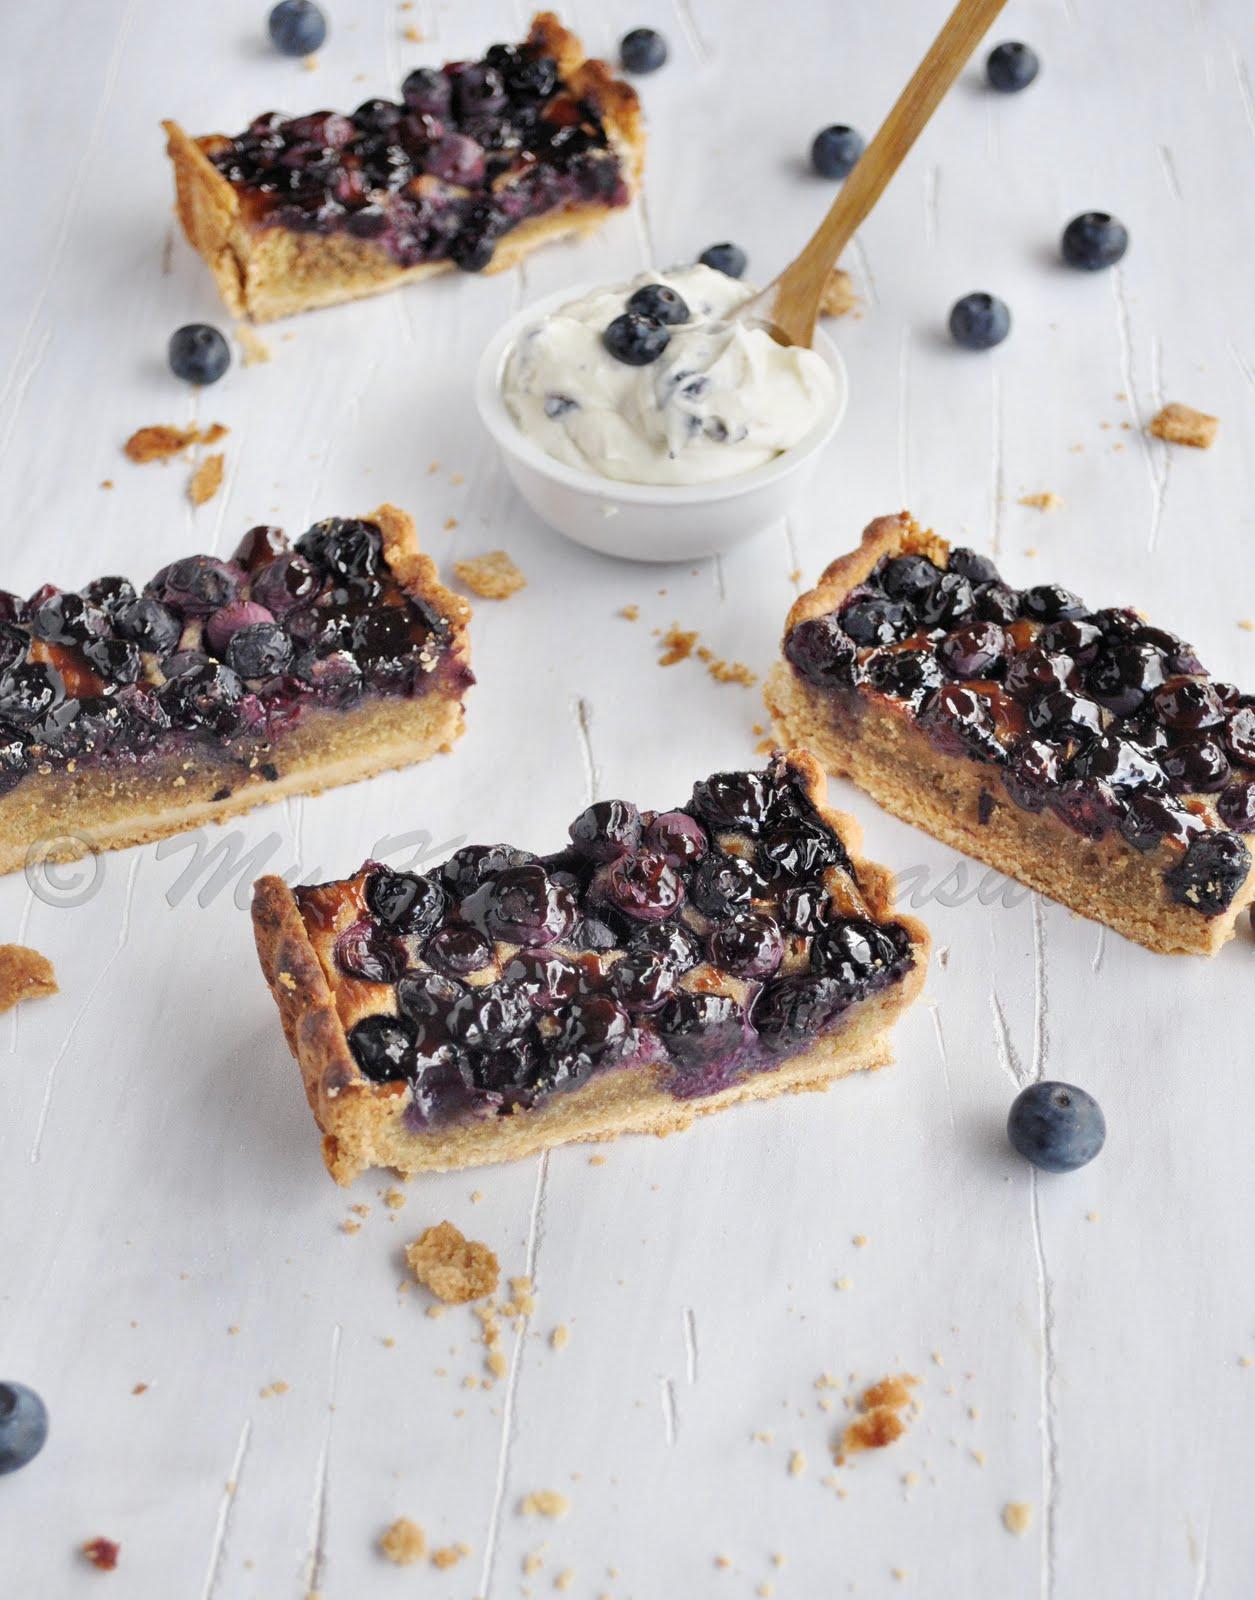 My Kitchen Treasures: Blueberry and Frangipane Tart